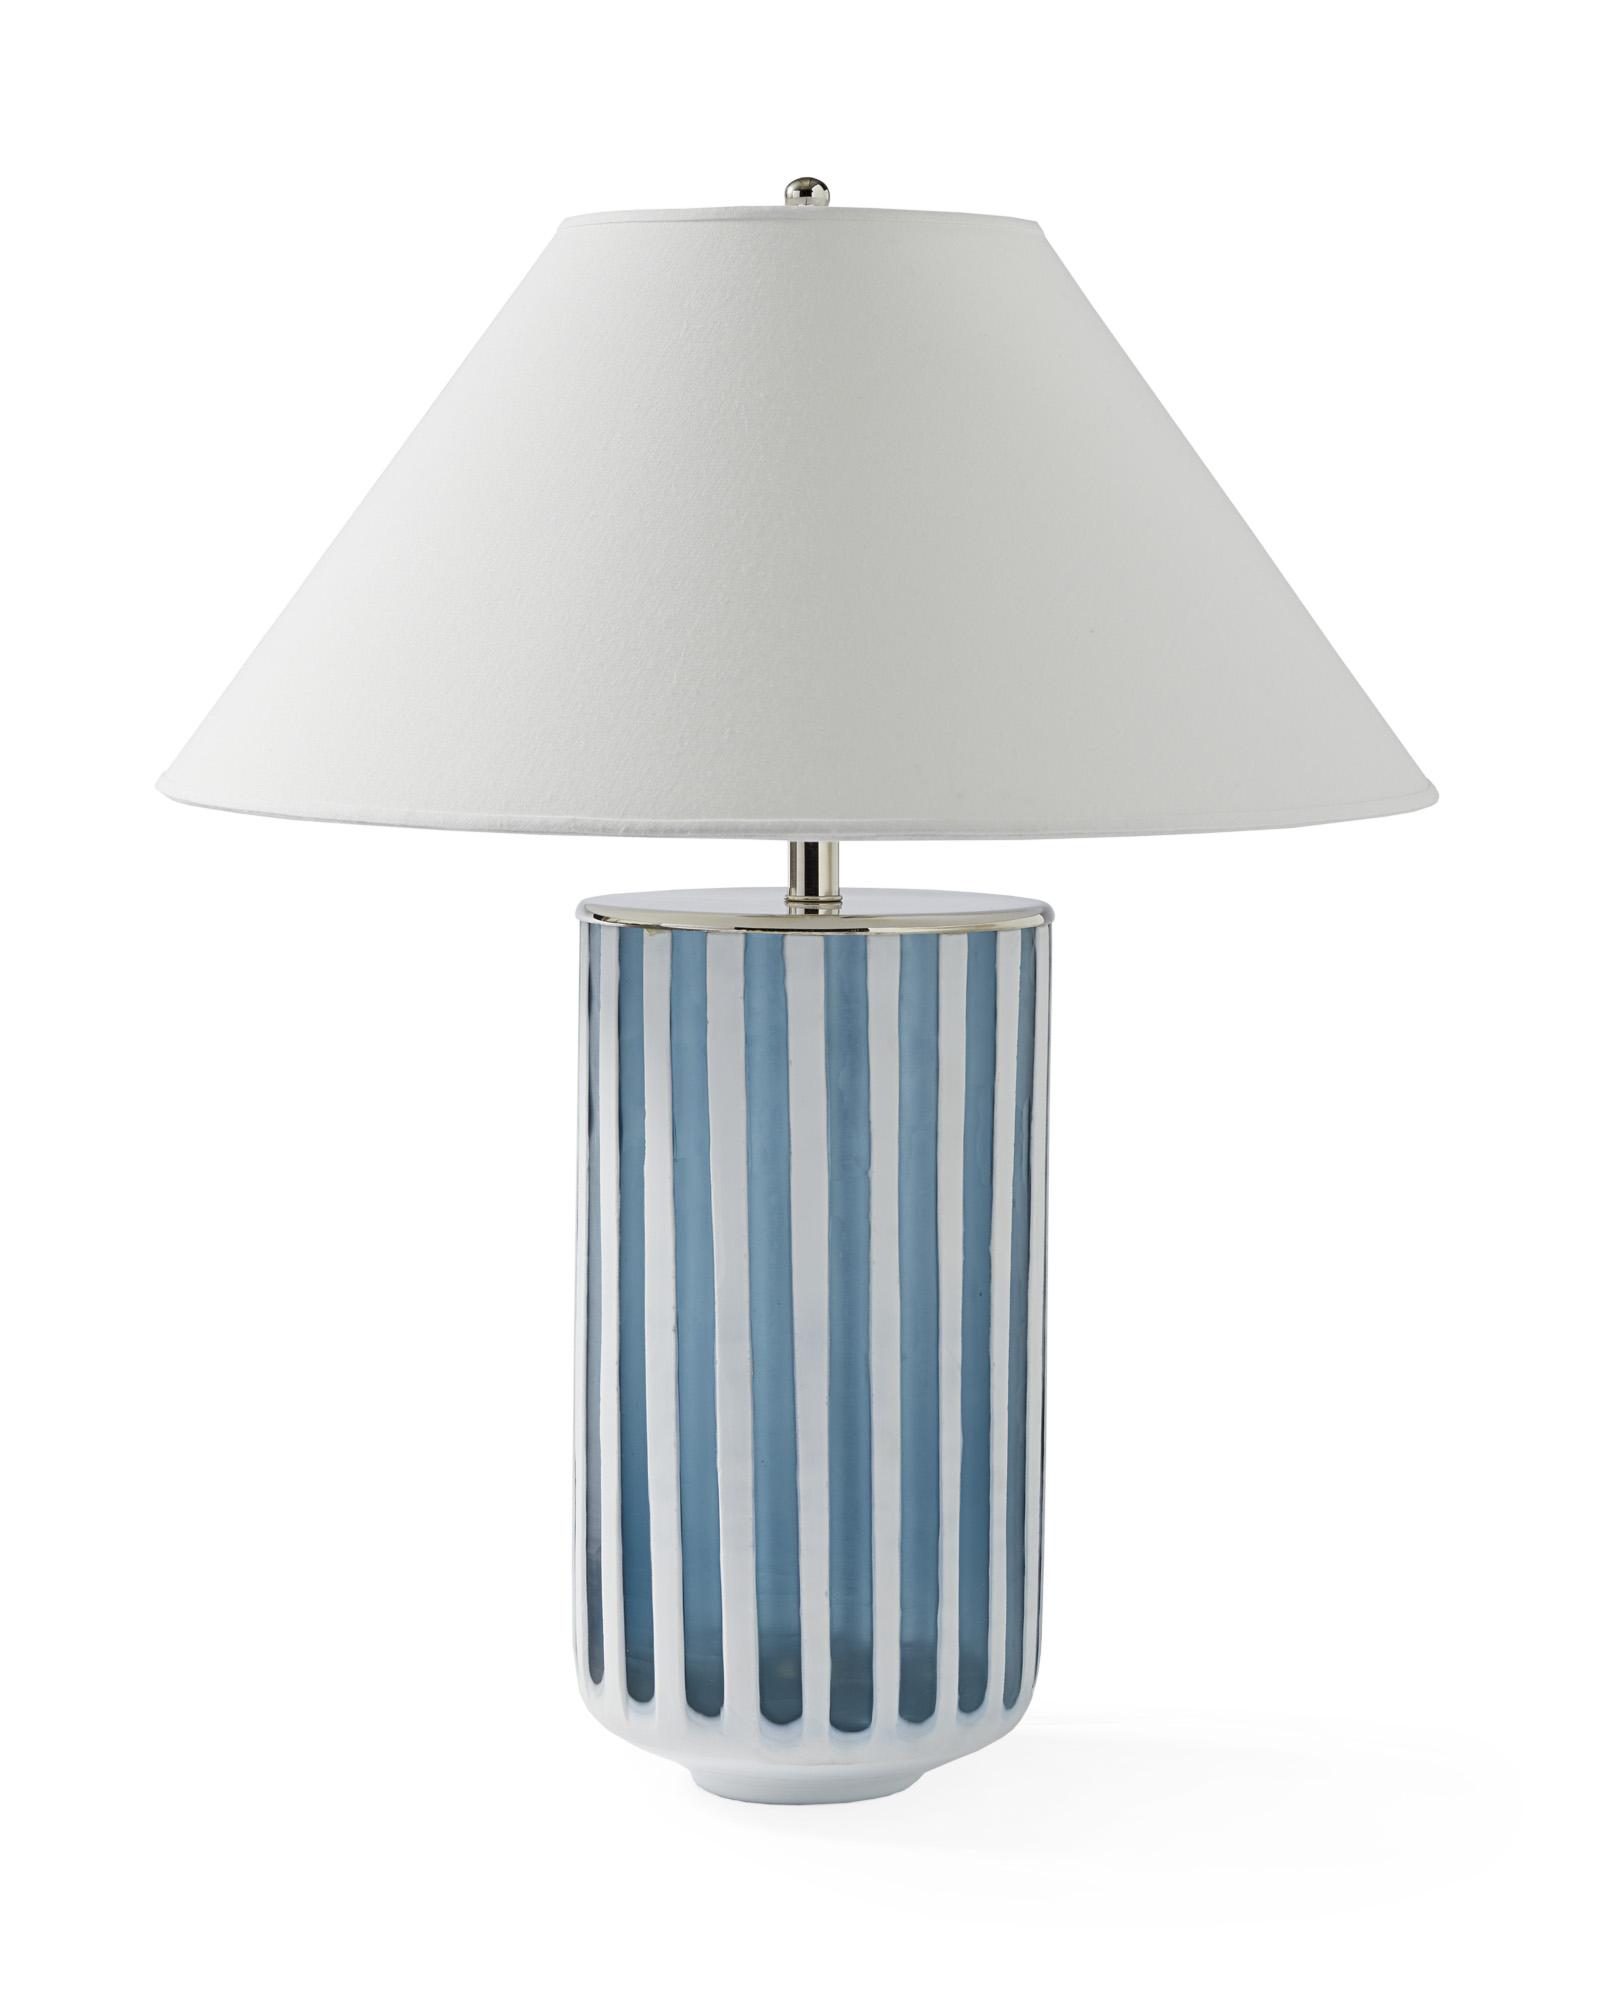 Lighting_Azure_Table_Lamp_MV_Crop_SH.jpg